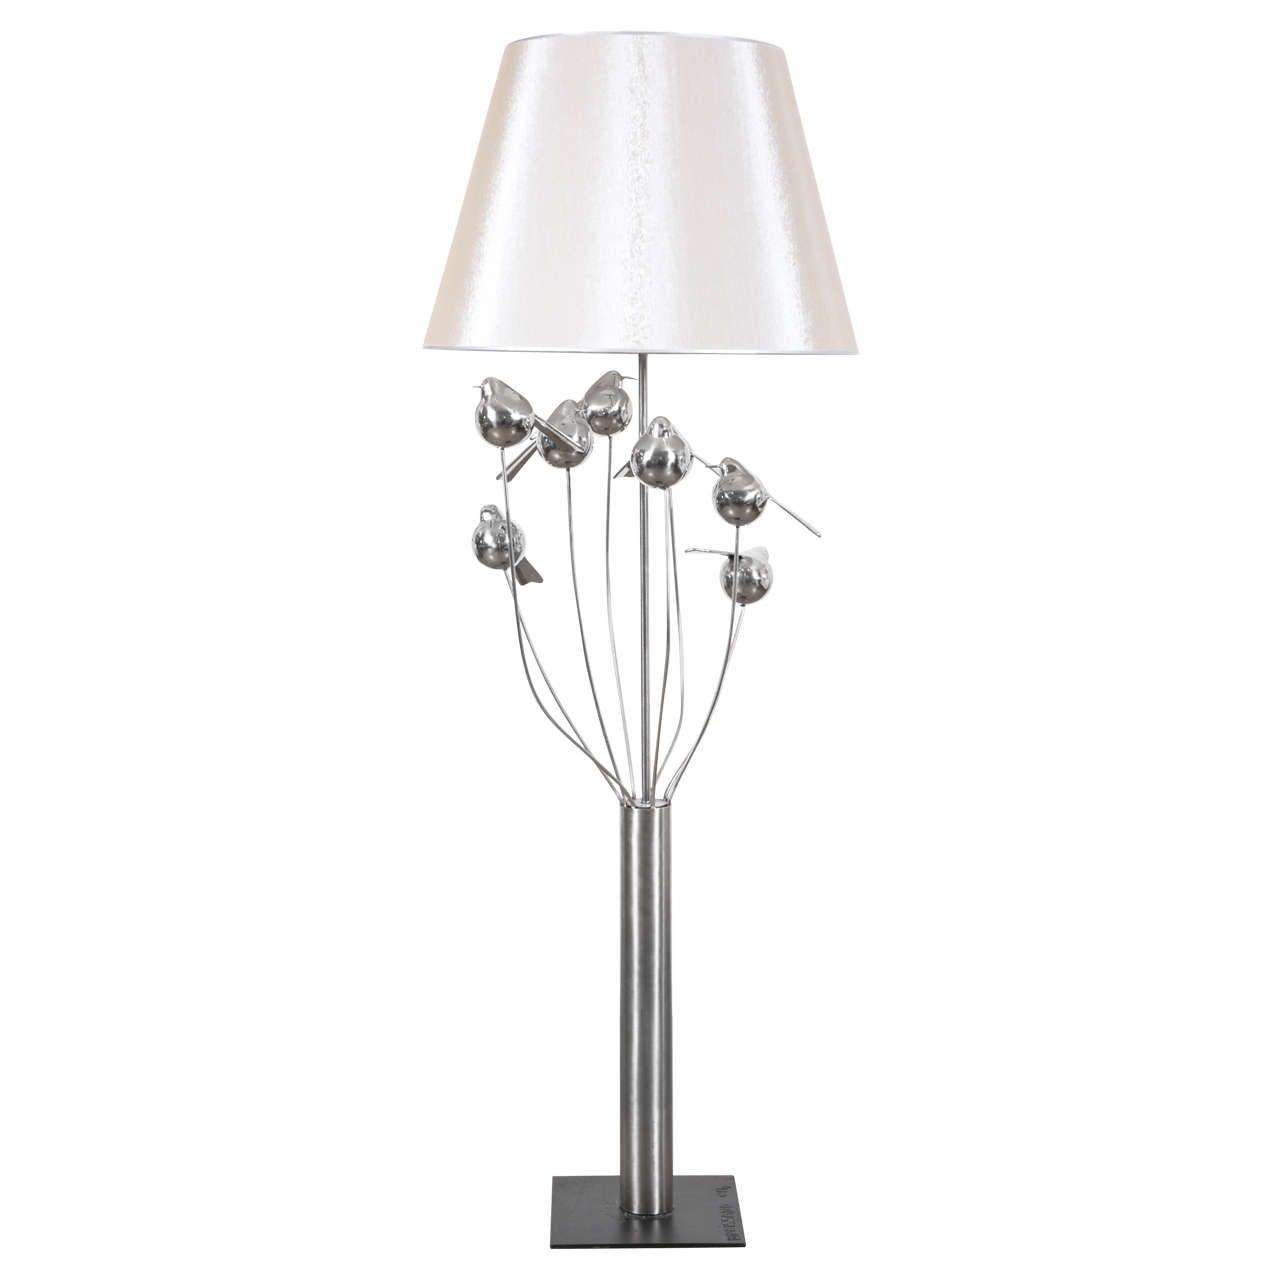 Birds sculpture floor lamp for sale at 1stdibs inoxydable steel birds floor lamp 2014 by ren broissand aloadofball Choice Image